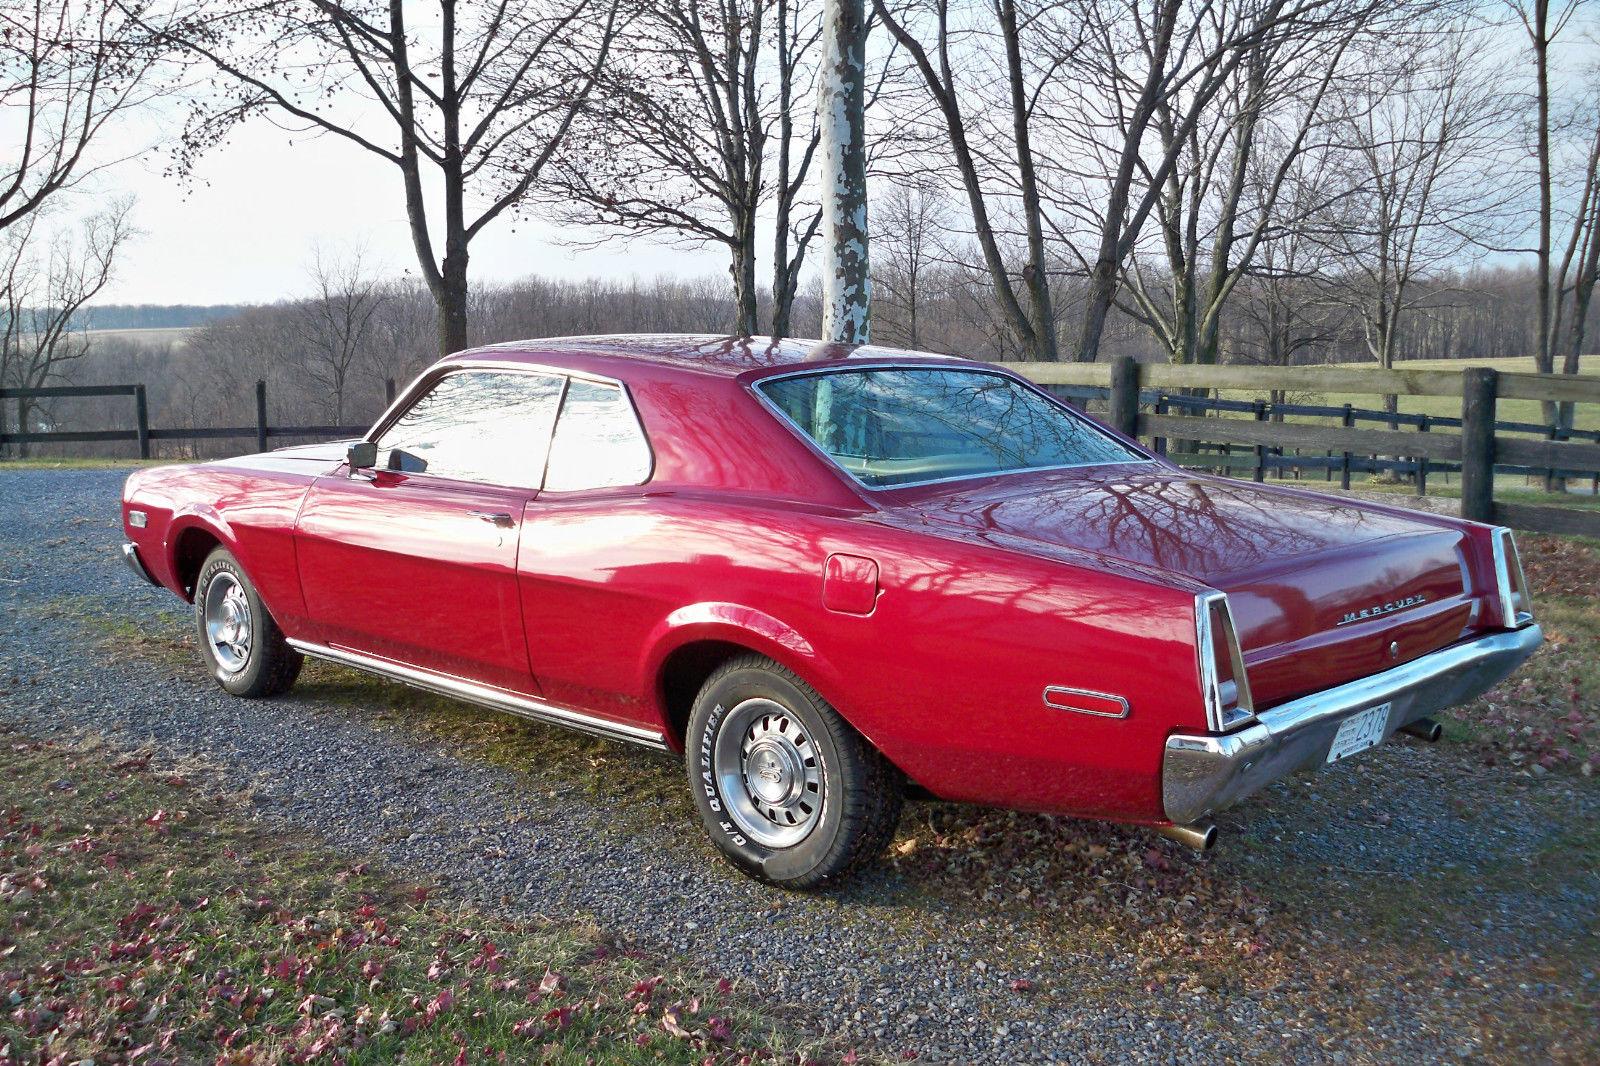 1968 Mercury Montego Classic Mercury Montego 1968 For Sale